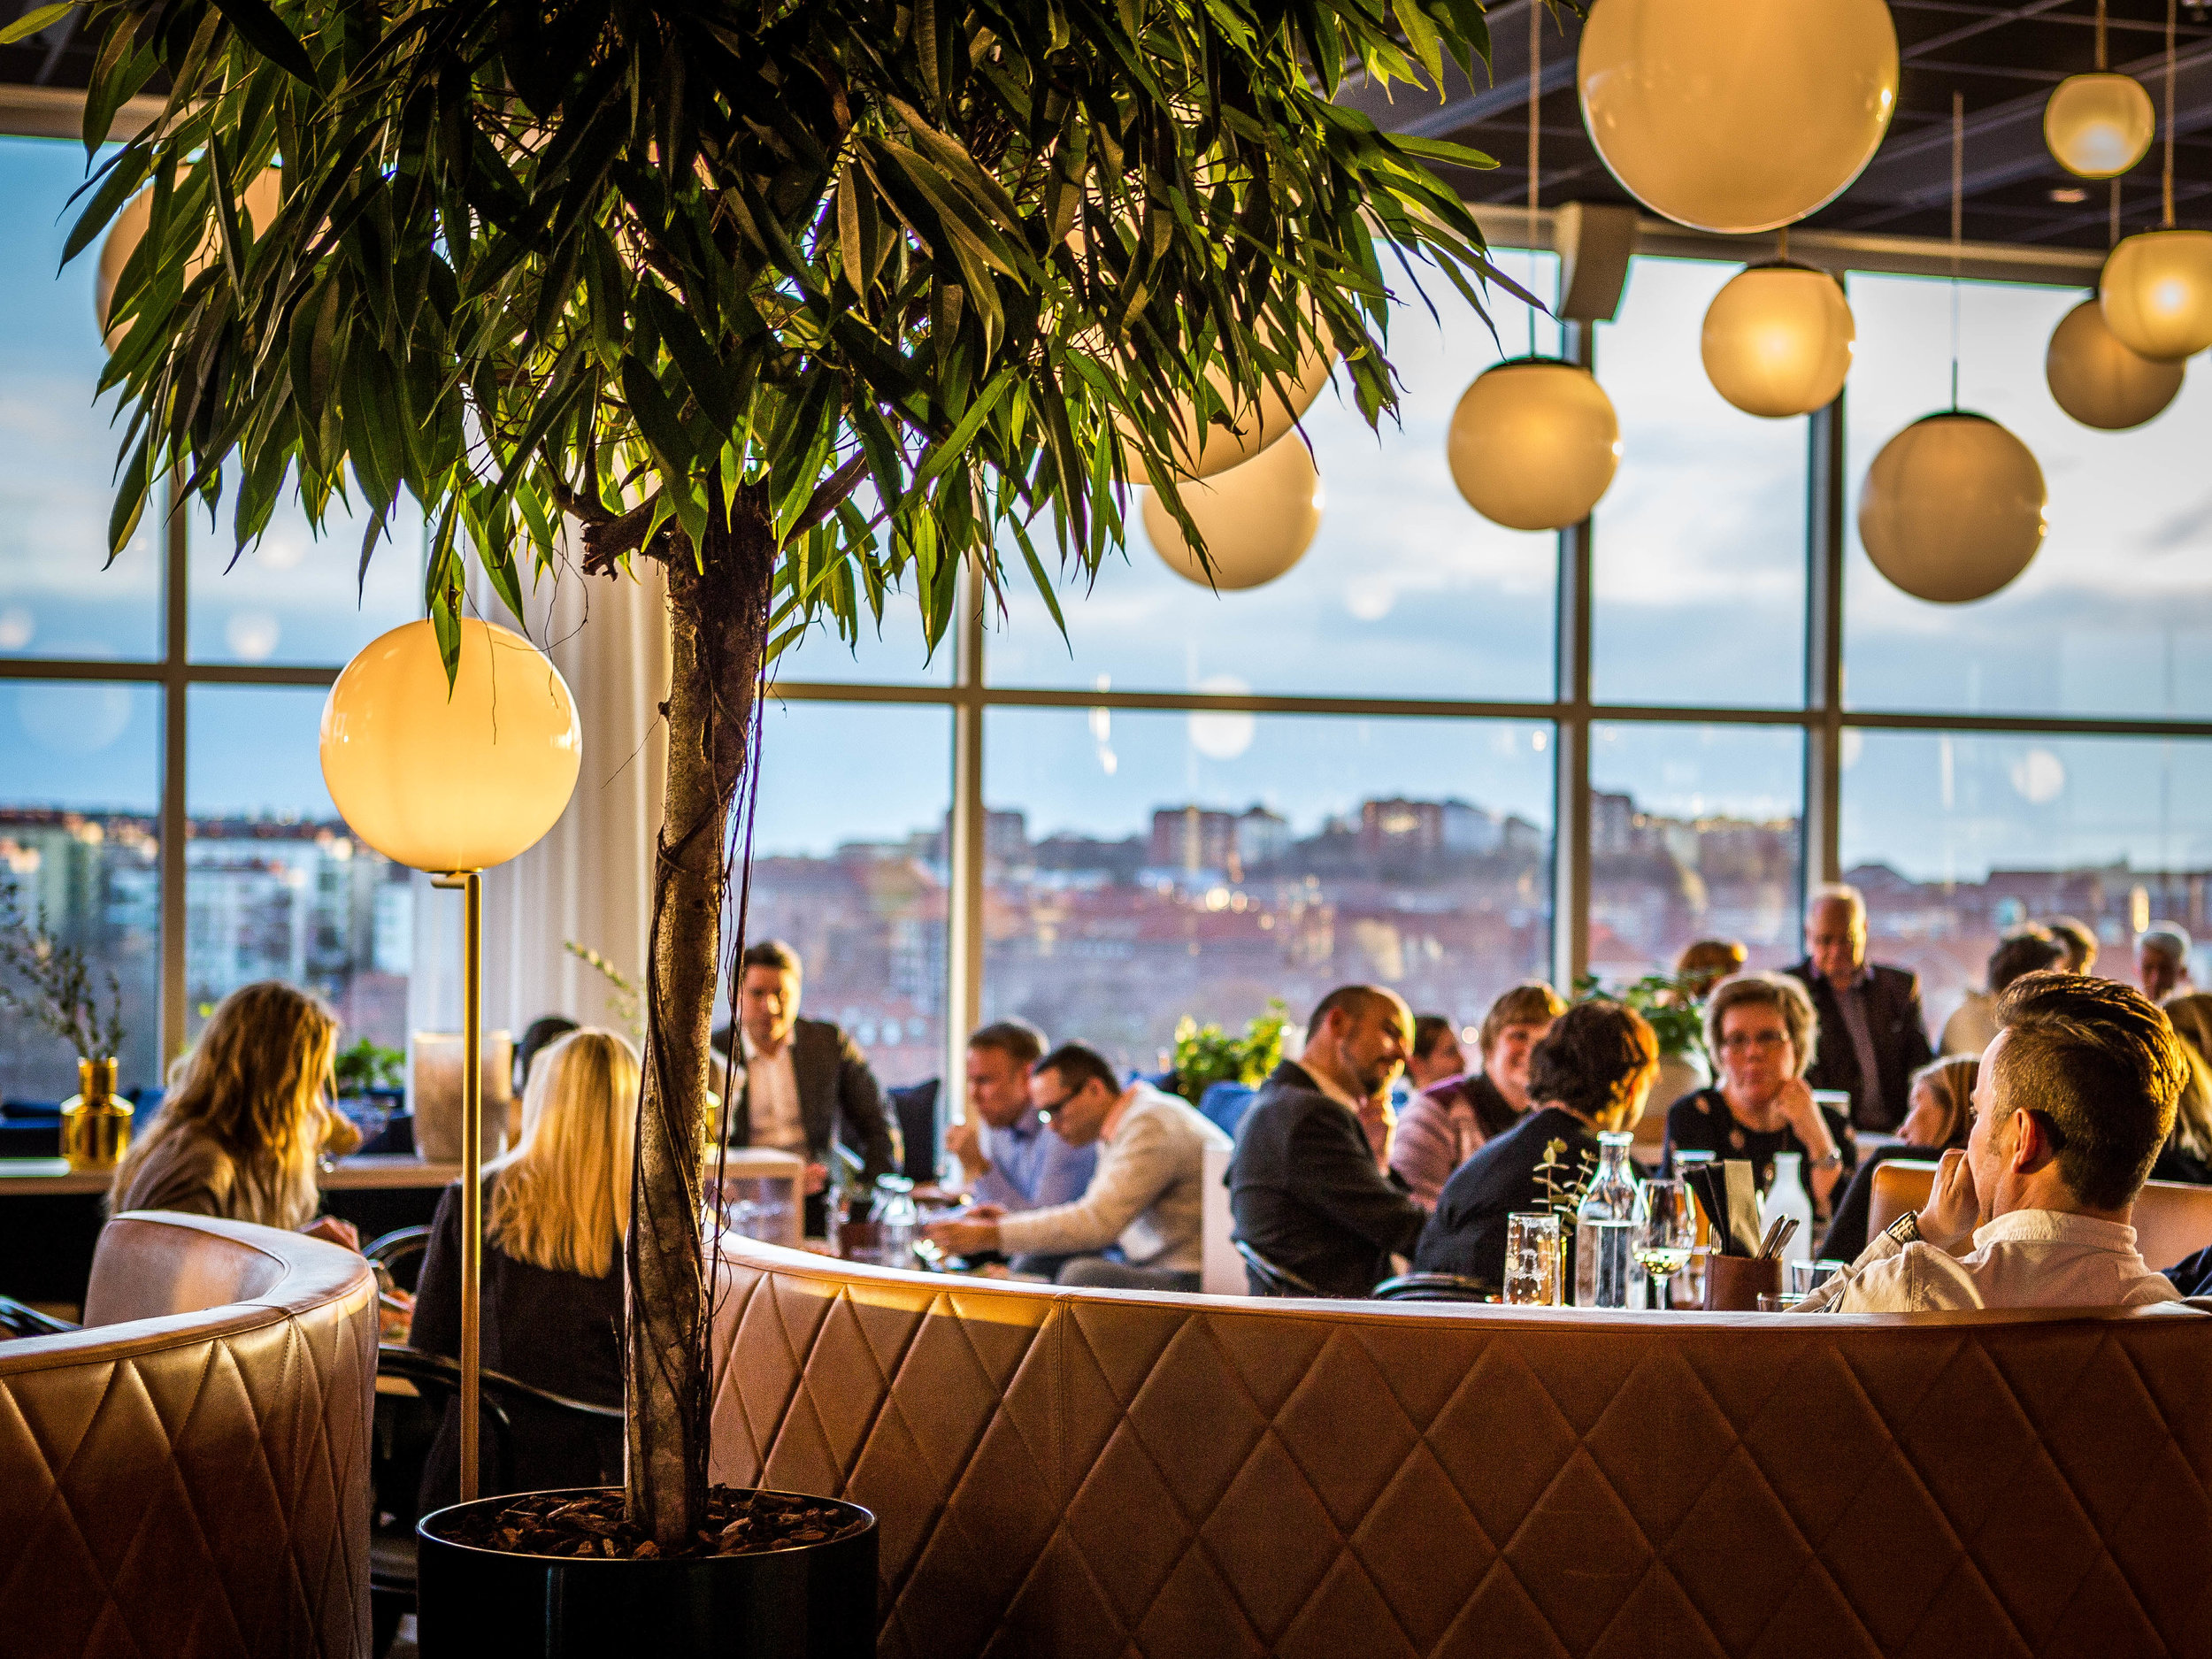 Sofa-restaurant-Heaven23-Gothenburg-Sweden-Facctory-photographer-Julio-Chang-1.jpg